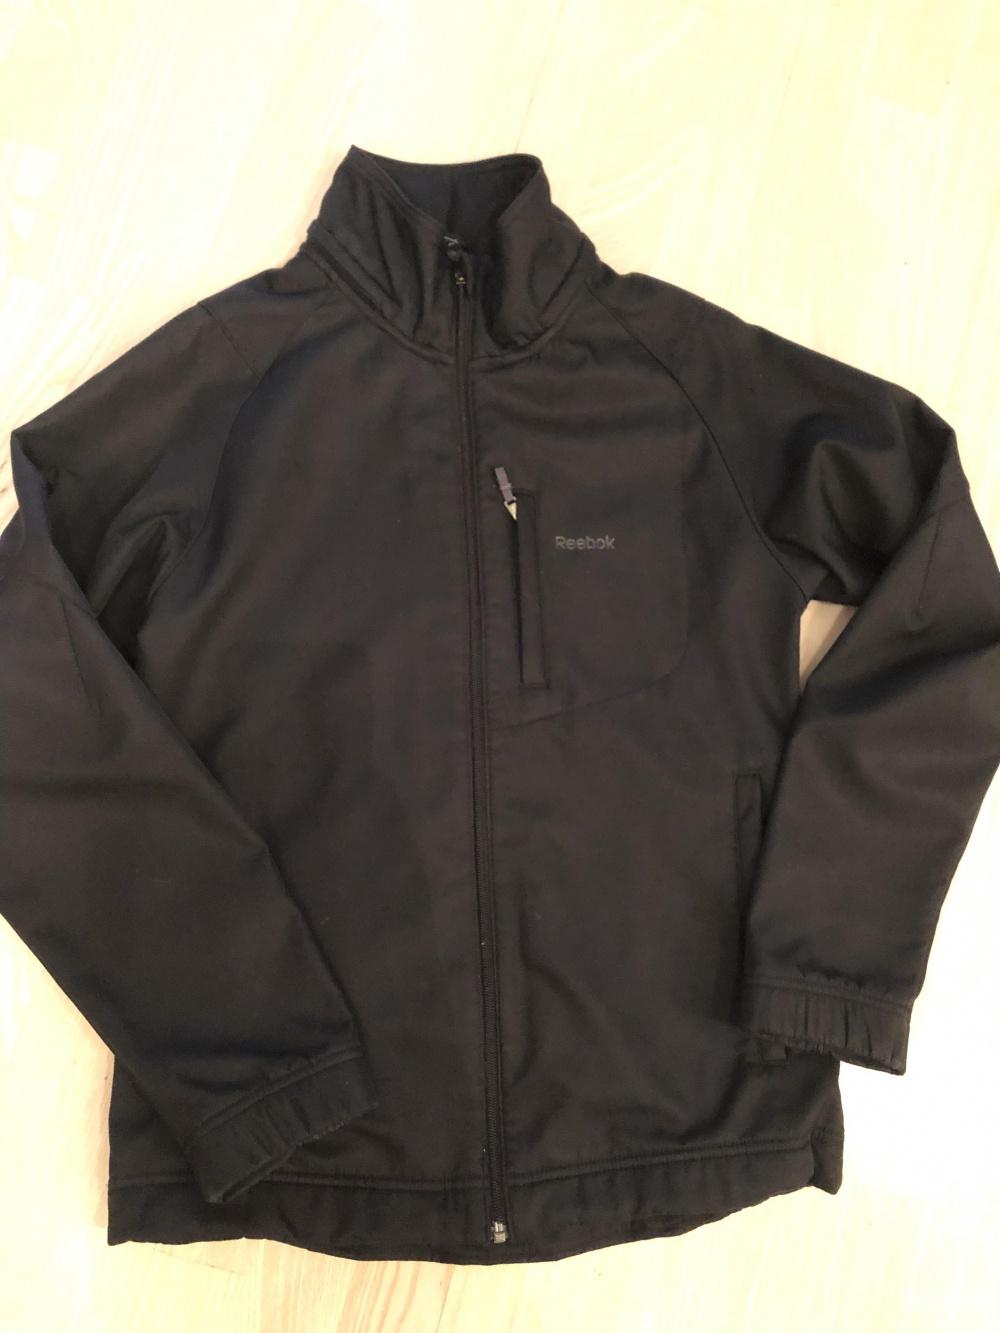 Горнолыжная куртка Reebok 44-46